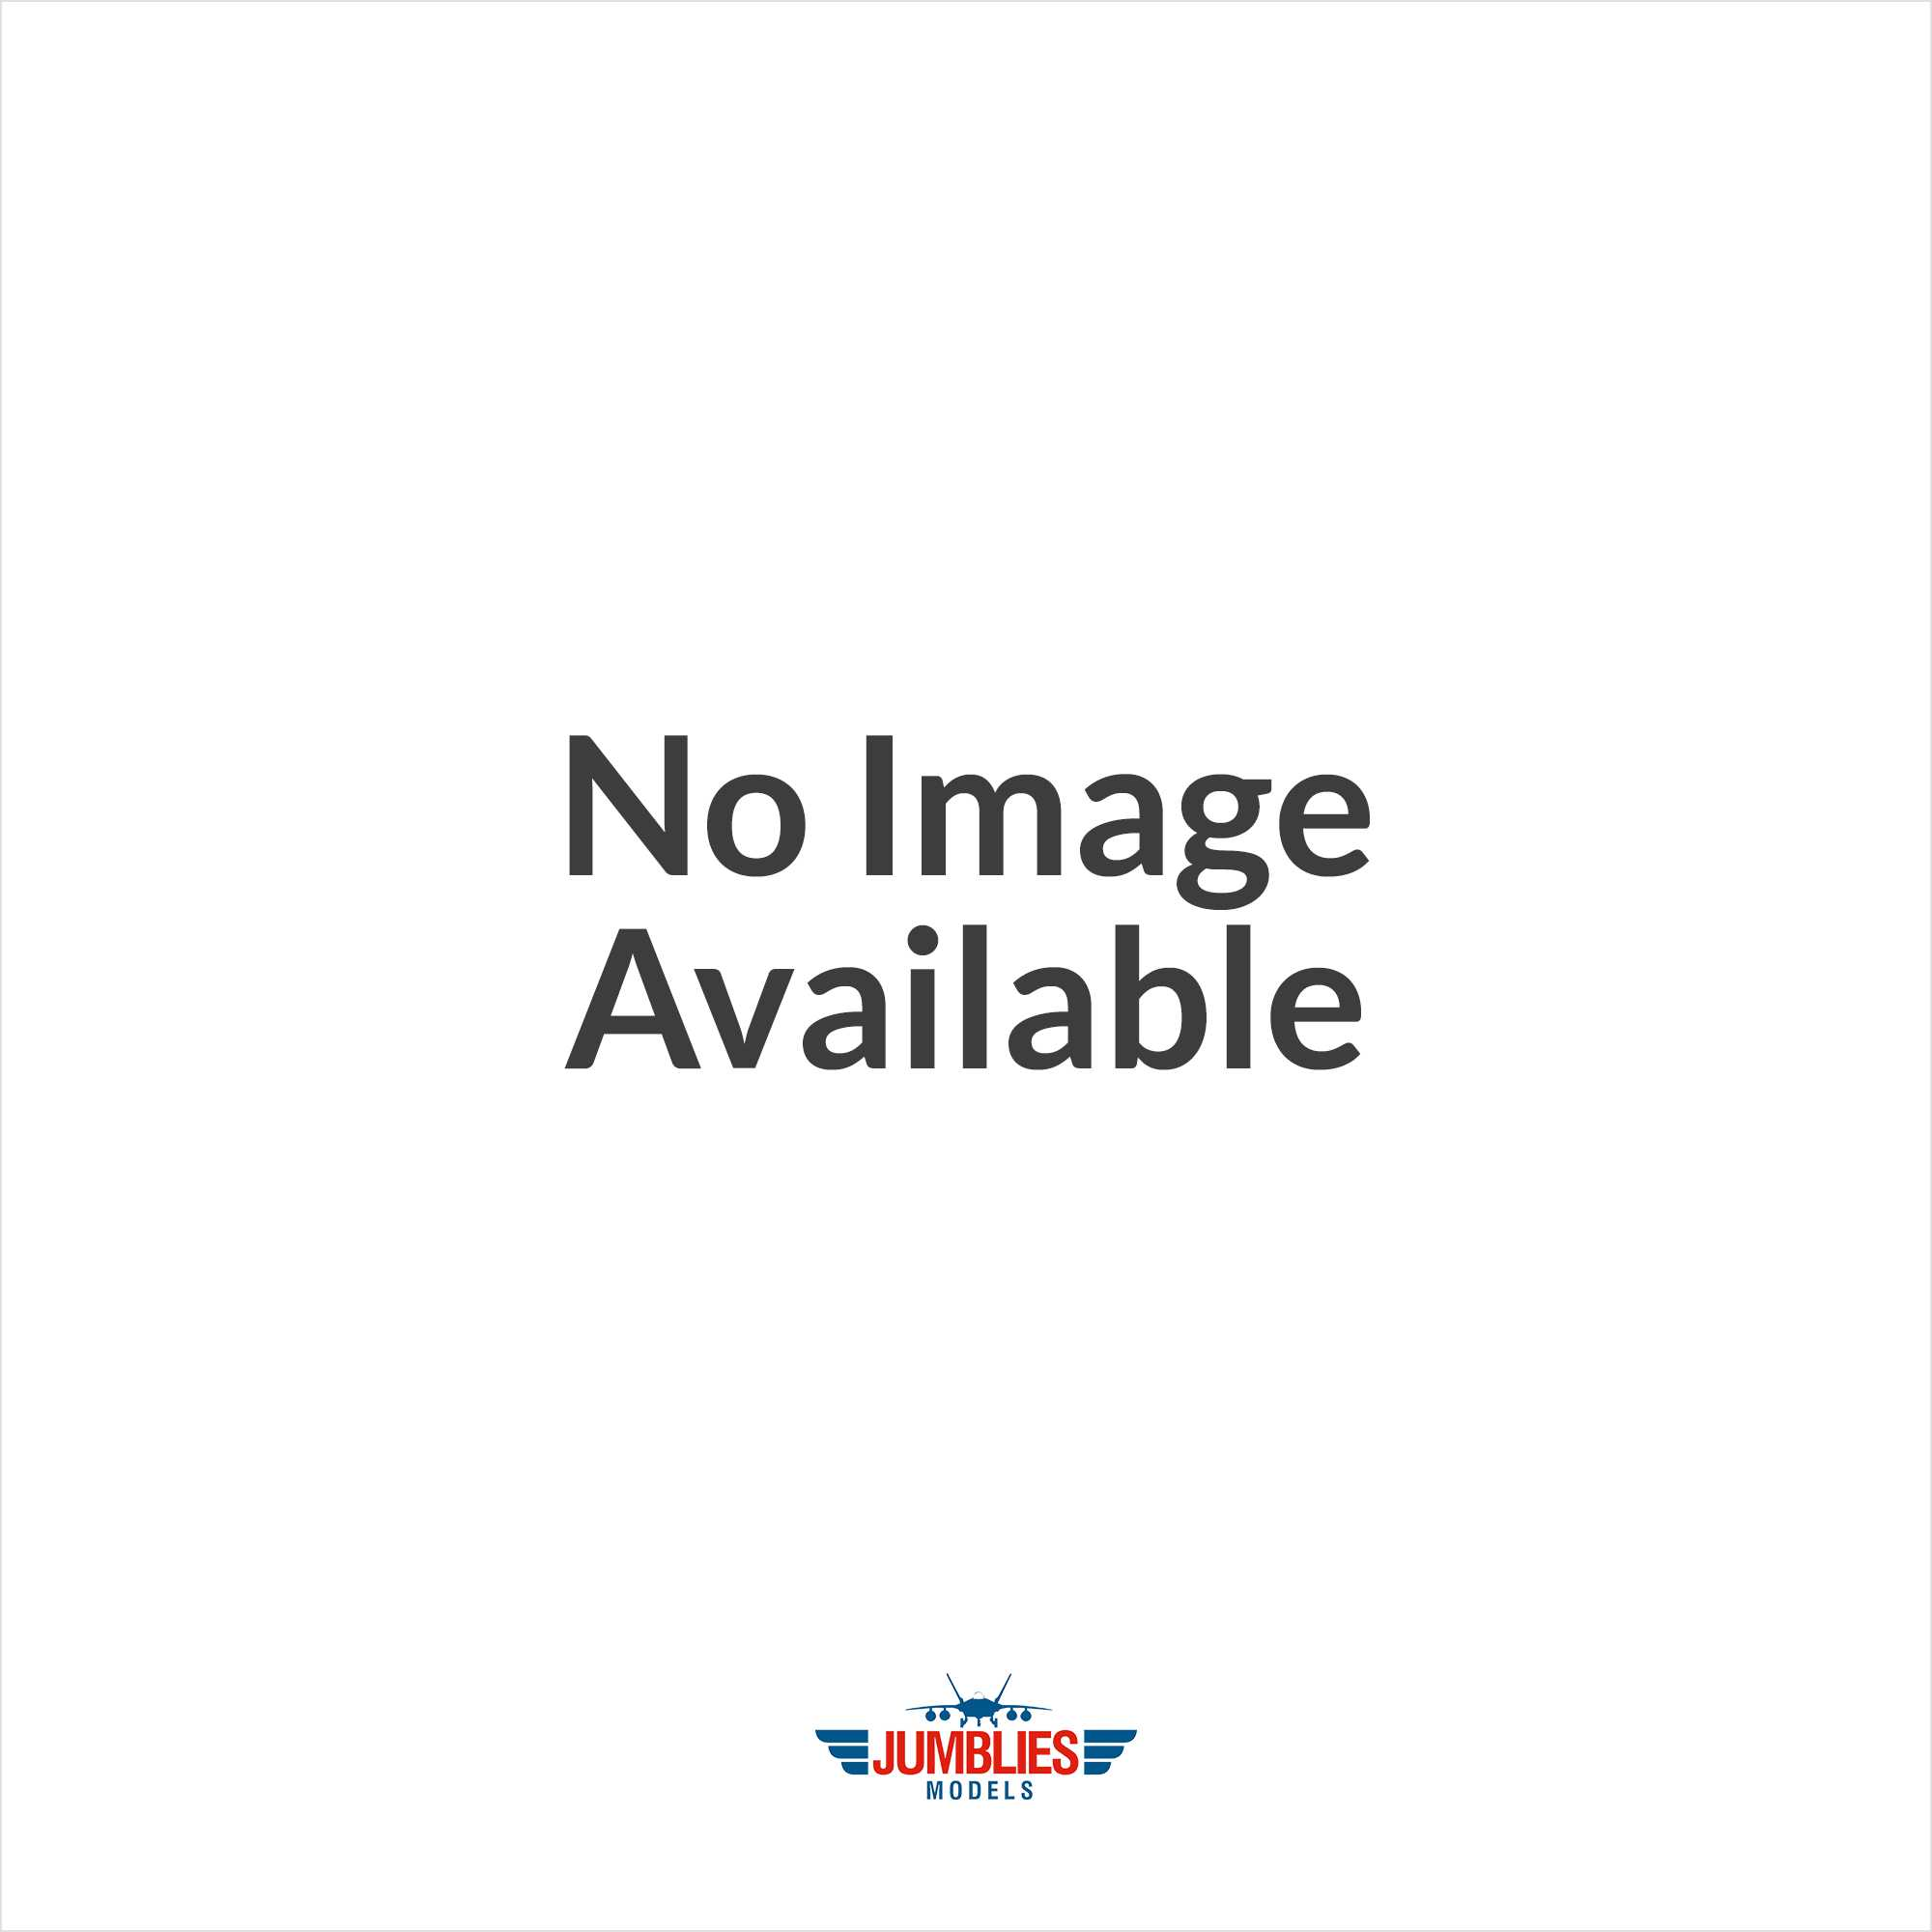 Minichamps Yamaha Ytz-M1 Movistar Yamaha - Valentino Rossi MotoGP 2015 - 1:12 Scale Diecast Model